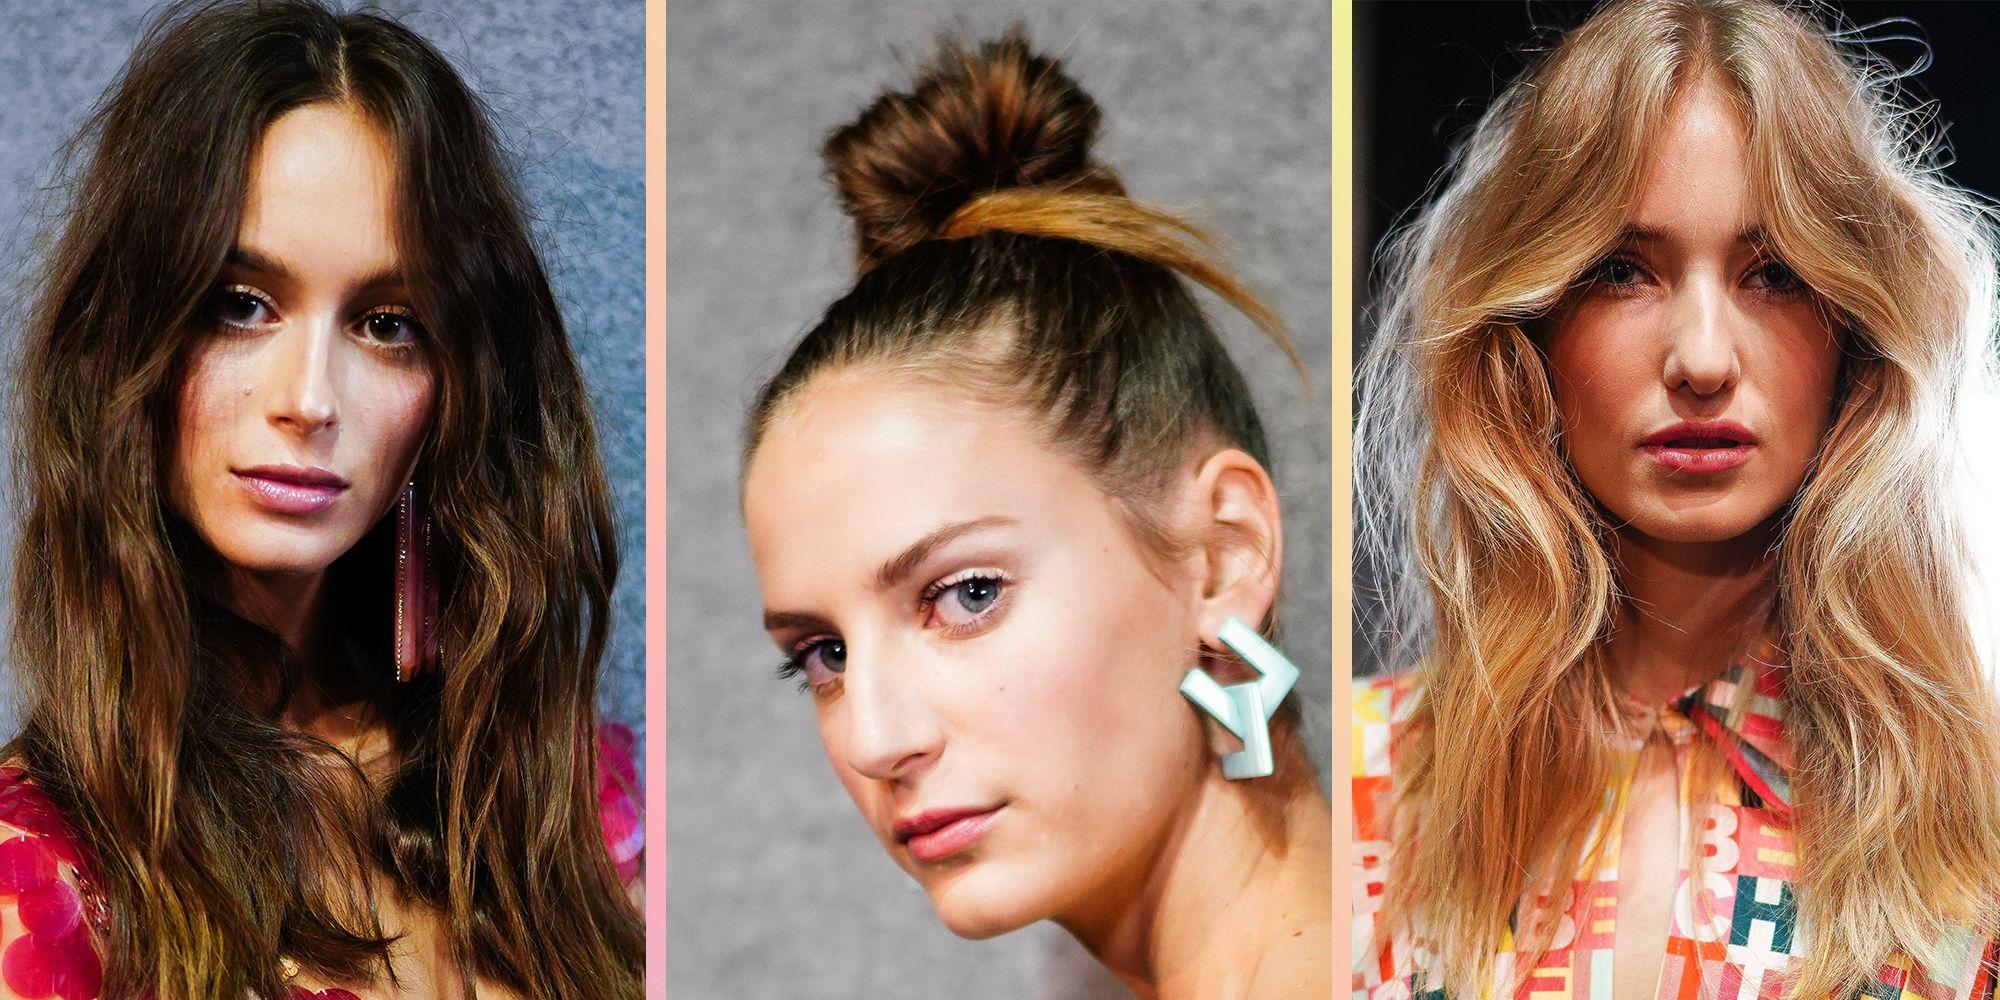 Acconciature capelli medi estate 2019